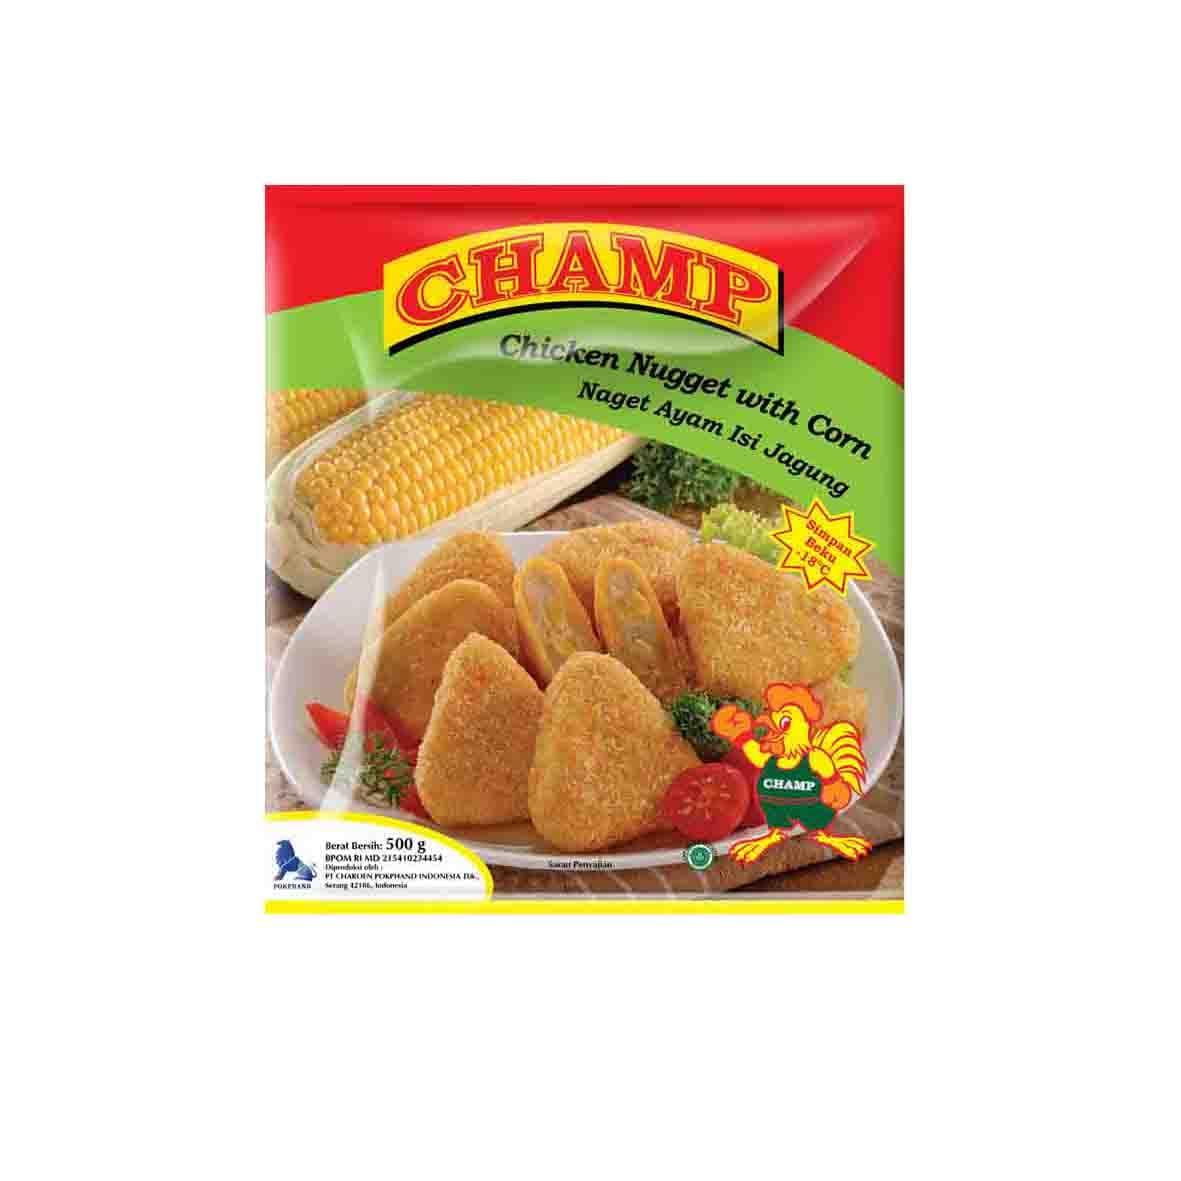 Champ Paket Nugget Jagung Makanan Instant 500 G (4 Pcs)